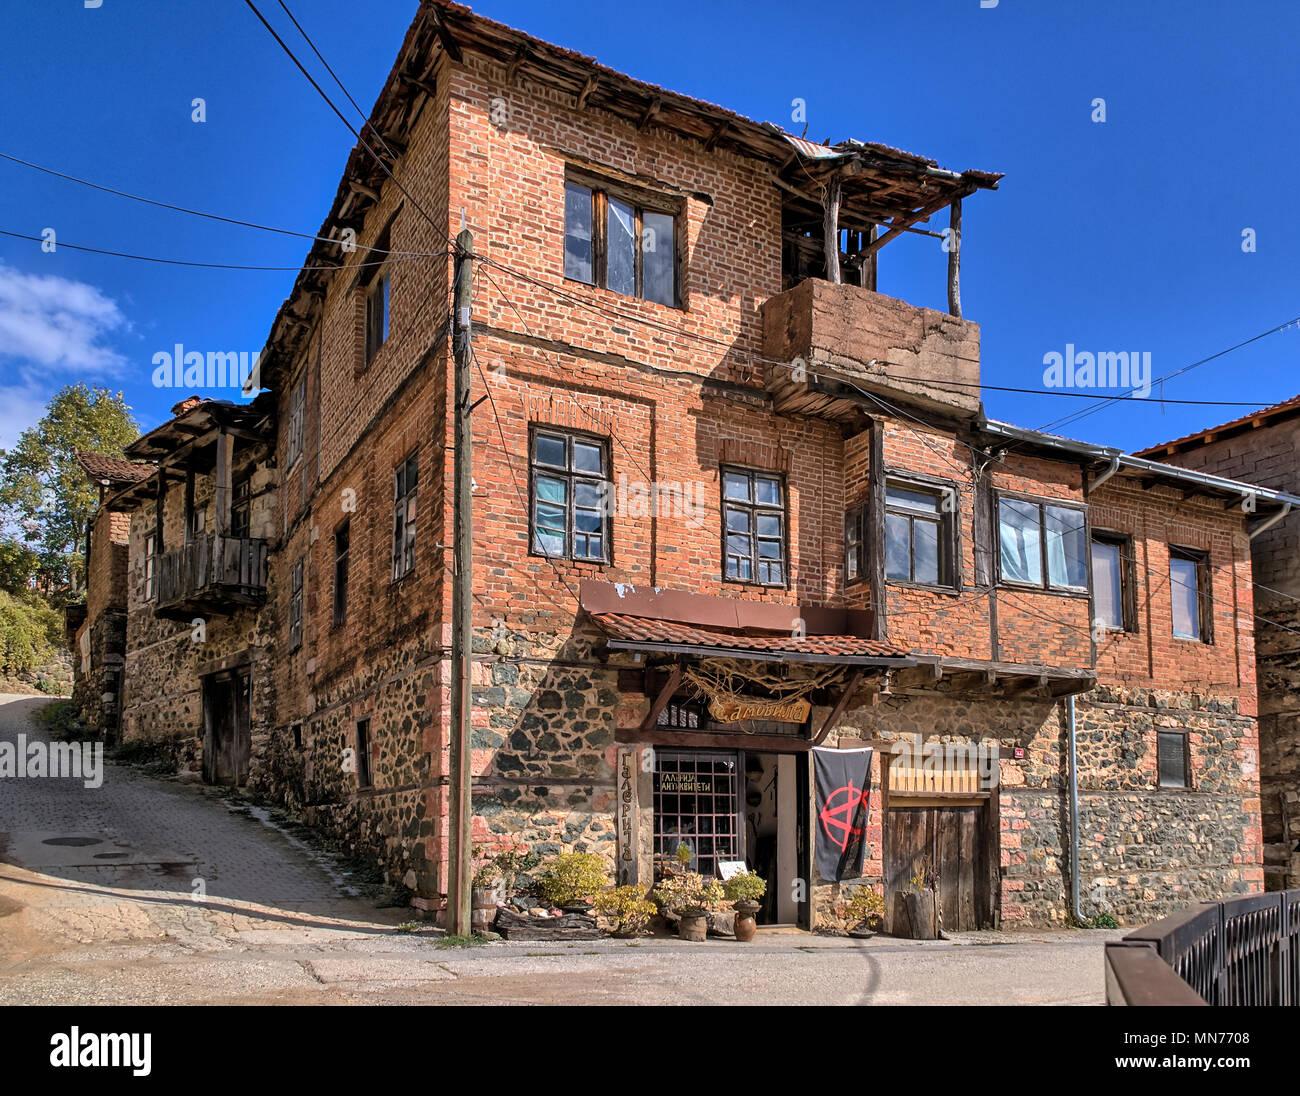 Old Traditional House Building in Republic of Vevčani in FYROM Macedonia, Balkans - Stock Image